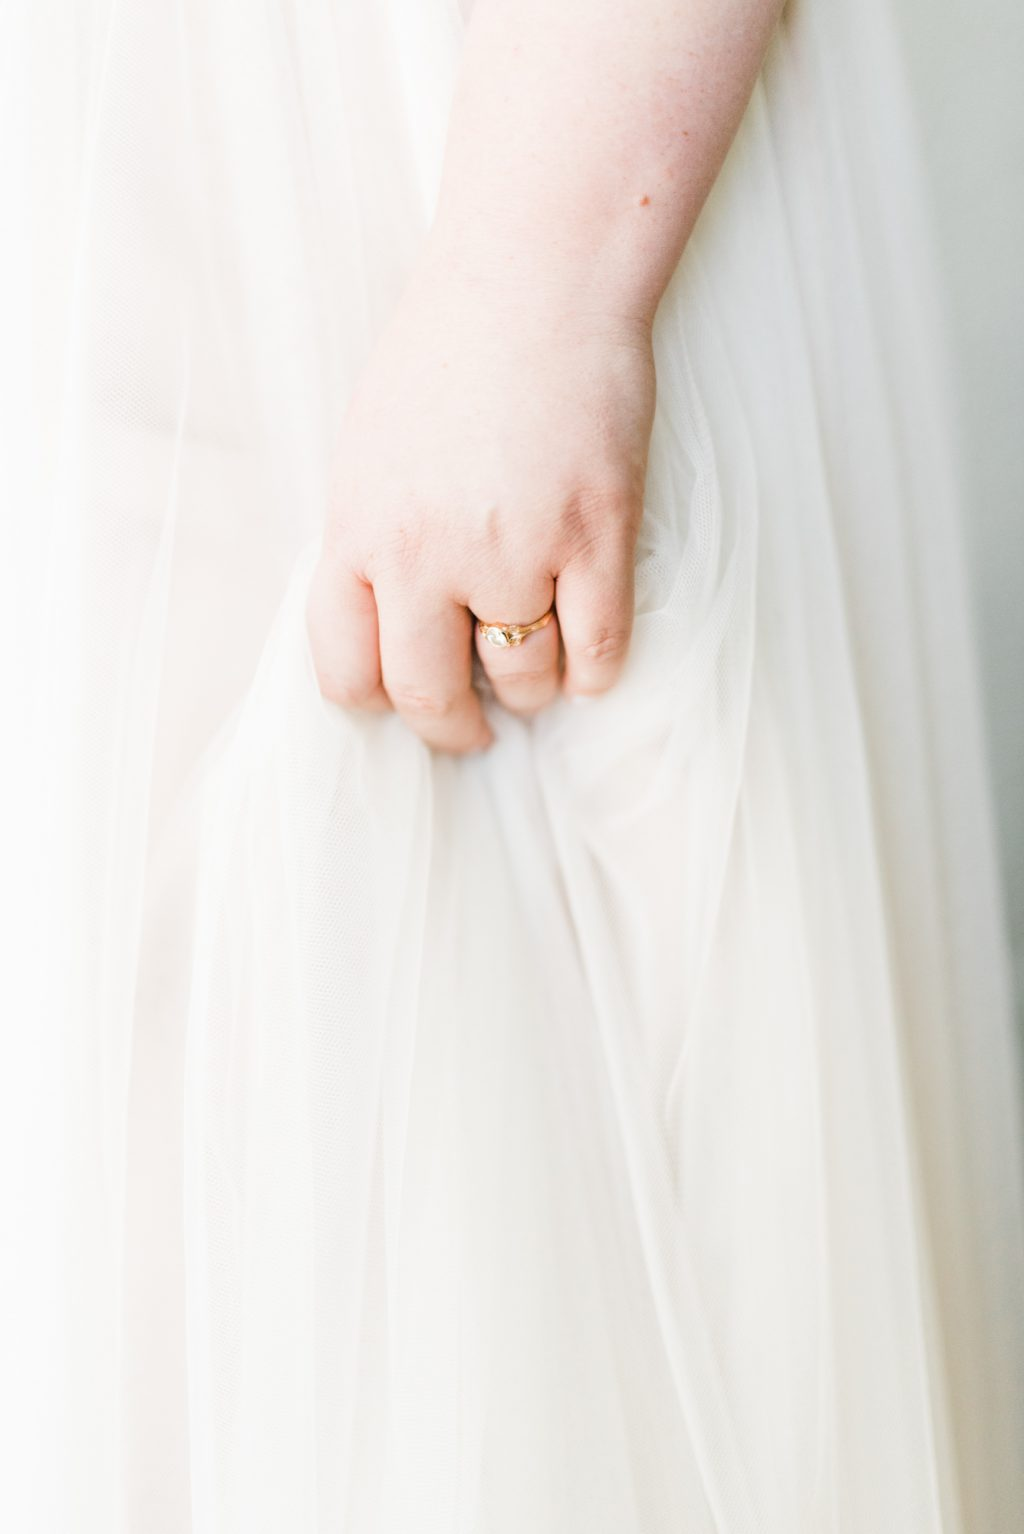 haley-richter-photo-west-chester-summer-wedding-boxcar-brewery-024